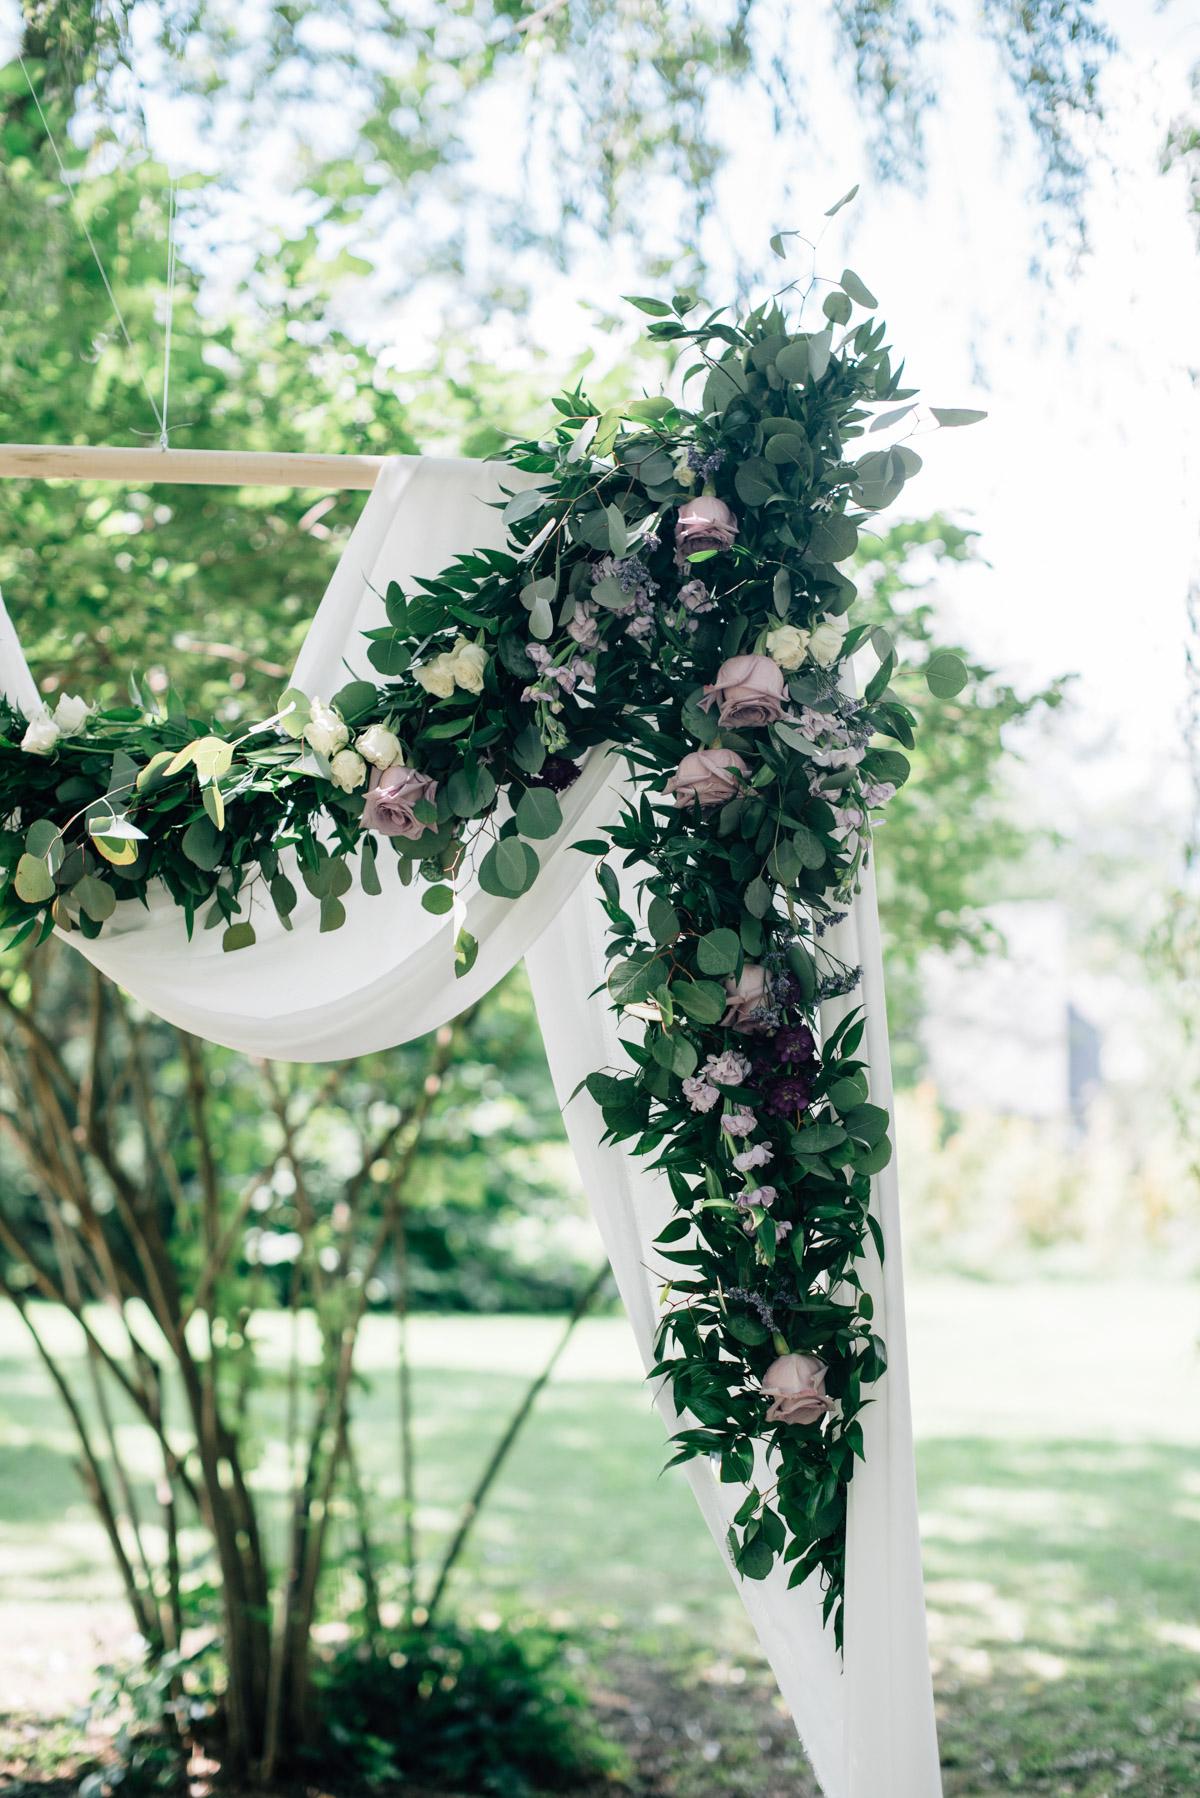 sara-wilde-photography-vineyard-bride-swish-list-beamer-falls-manor-grimsby-wedding-71.jpg